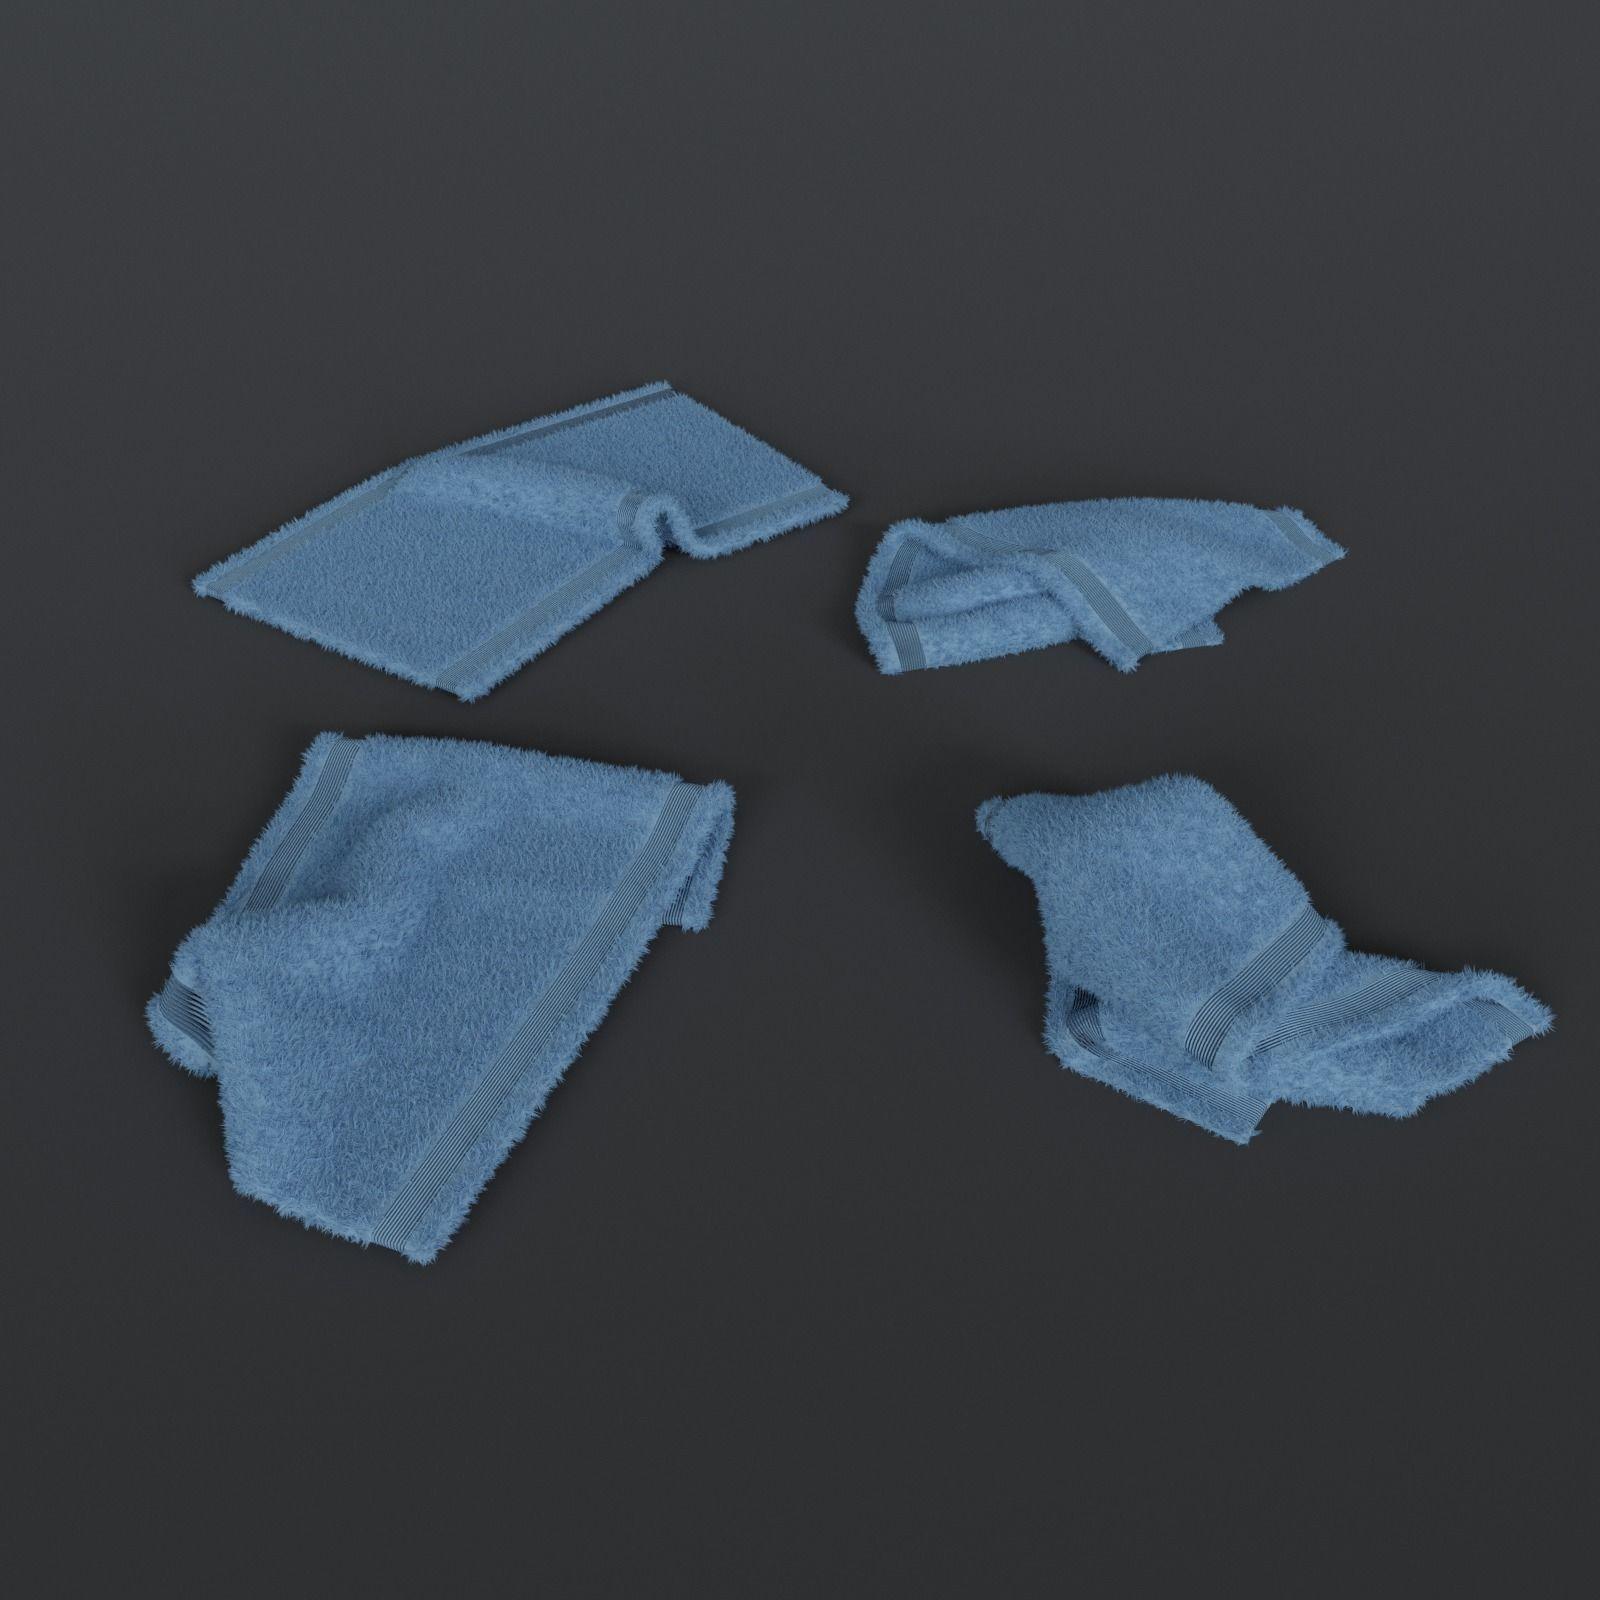 Crumpled towels set